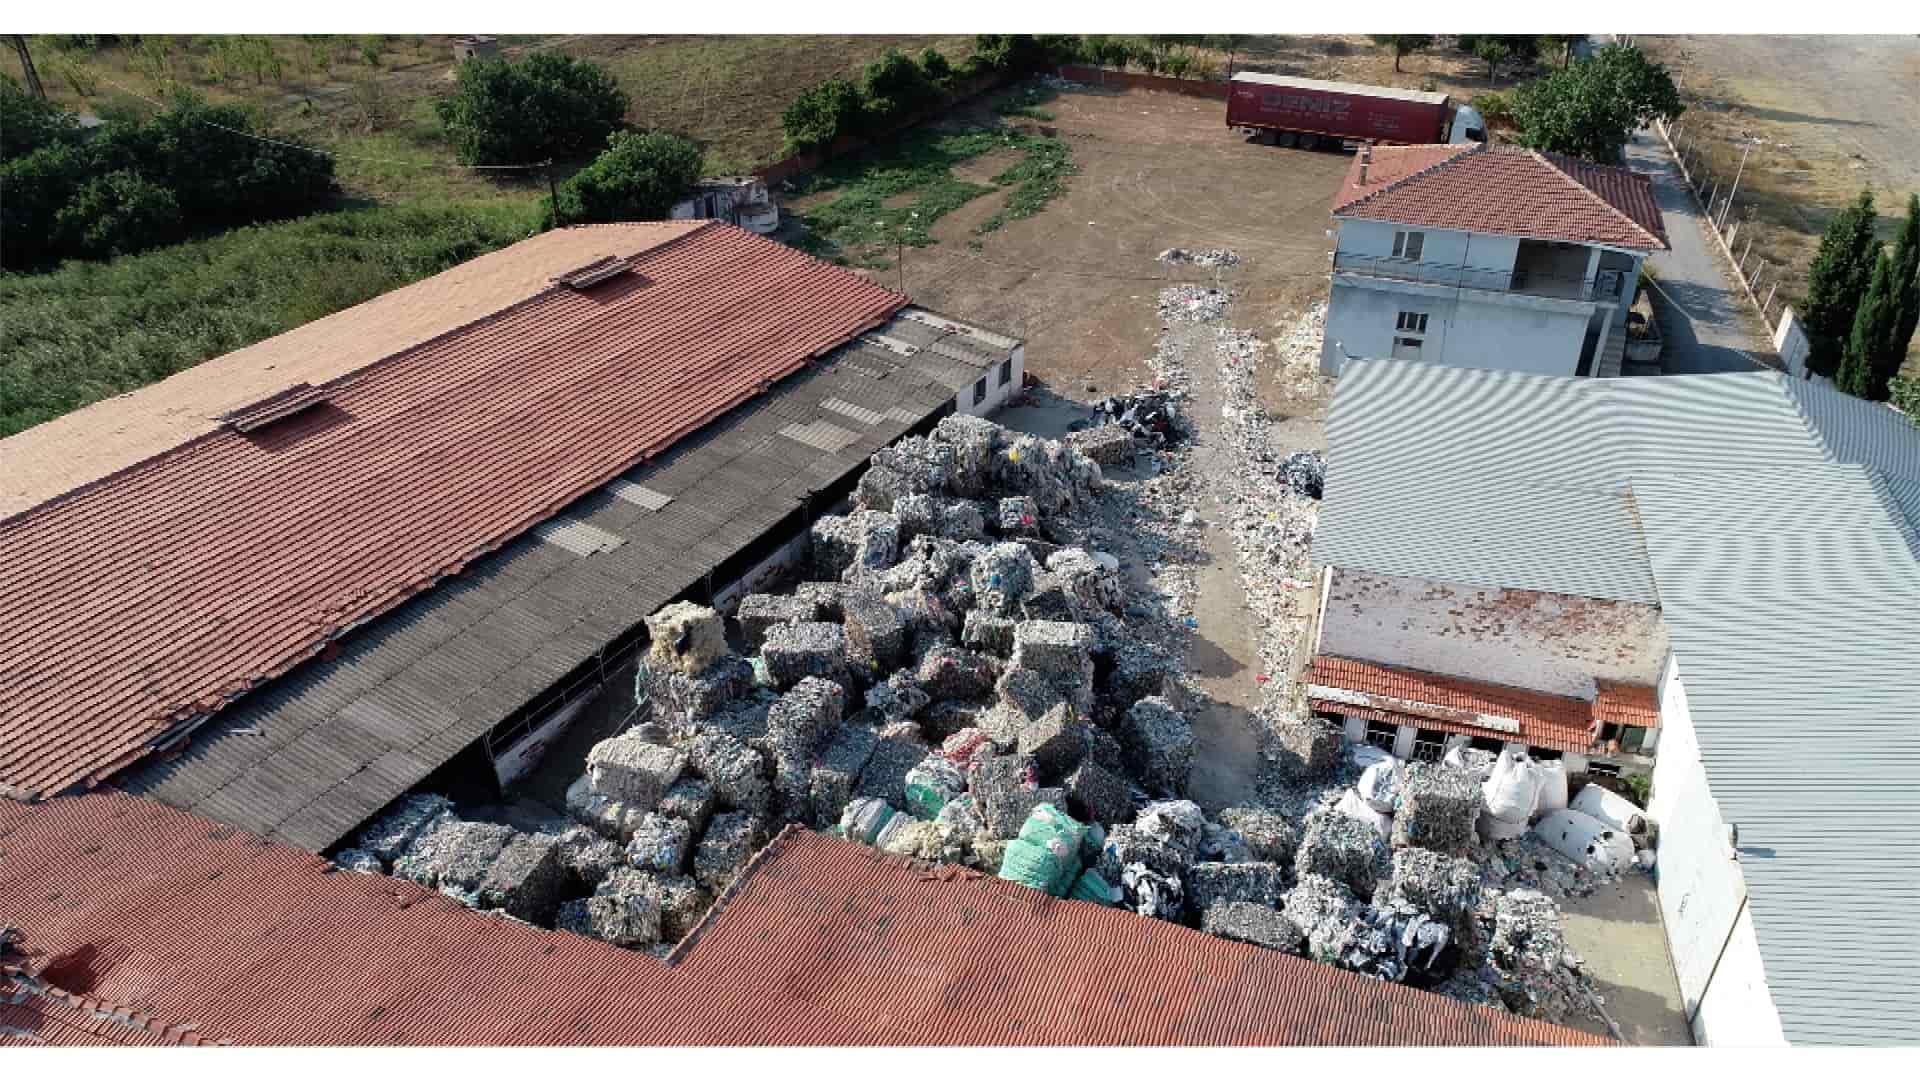 Turchia rifiuti